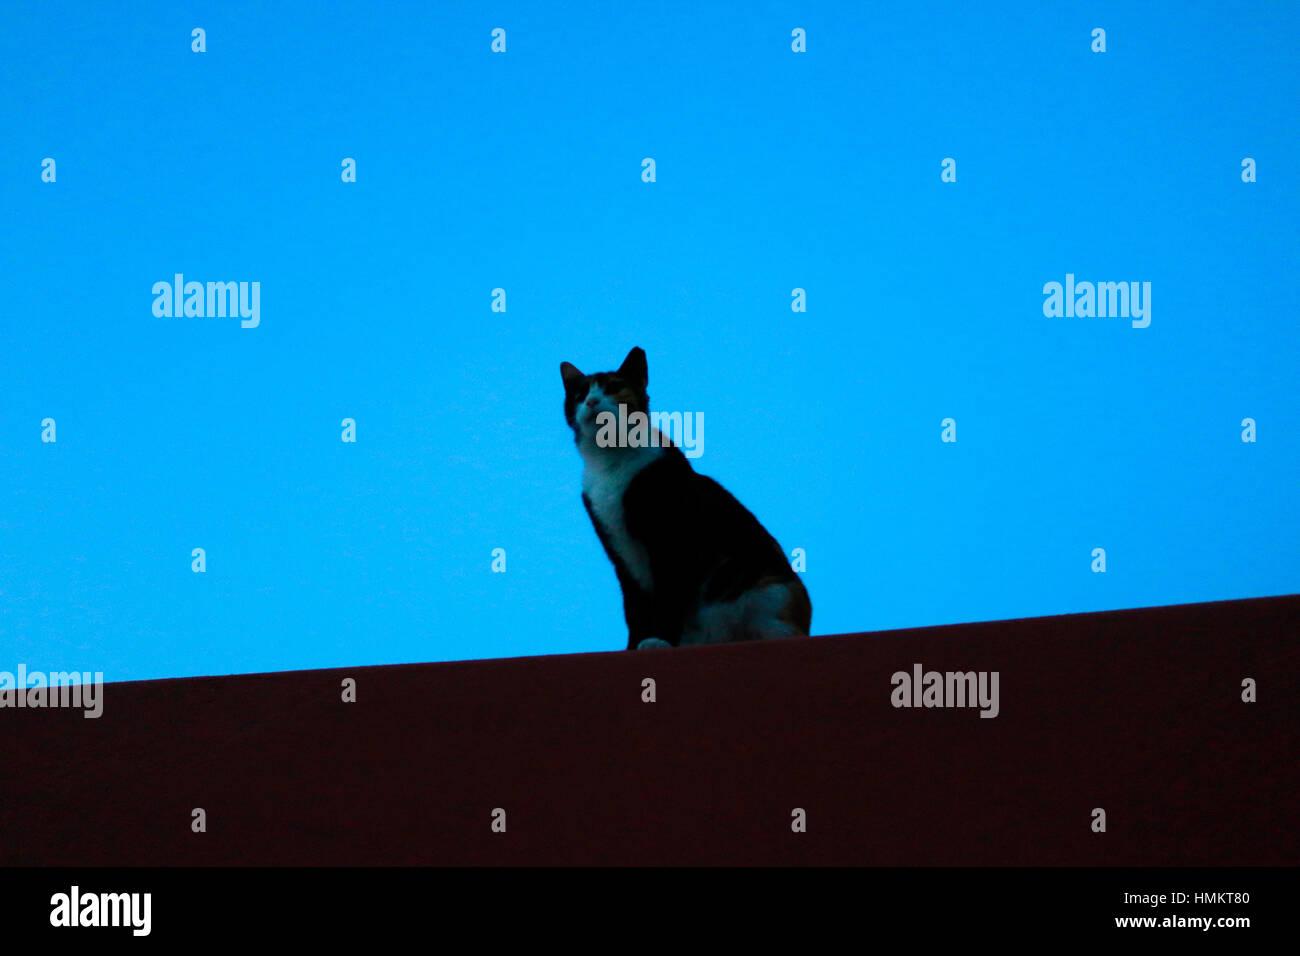 Katze, Athen, Griechenland. Stock Photo